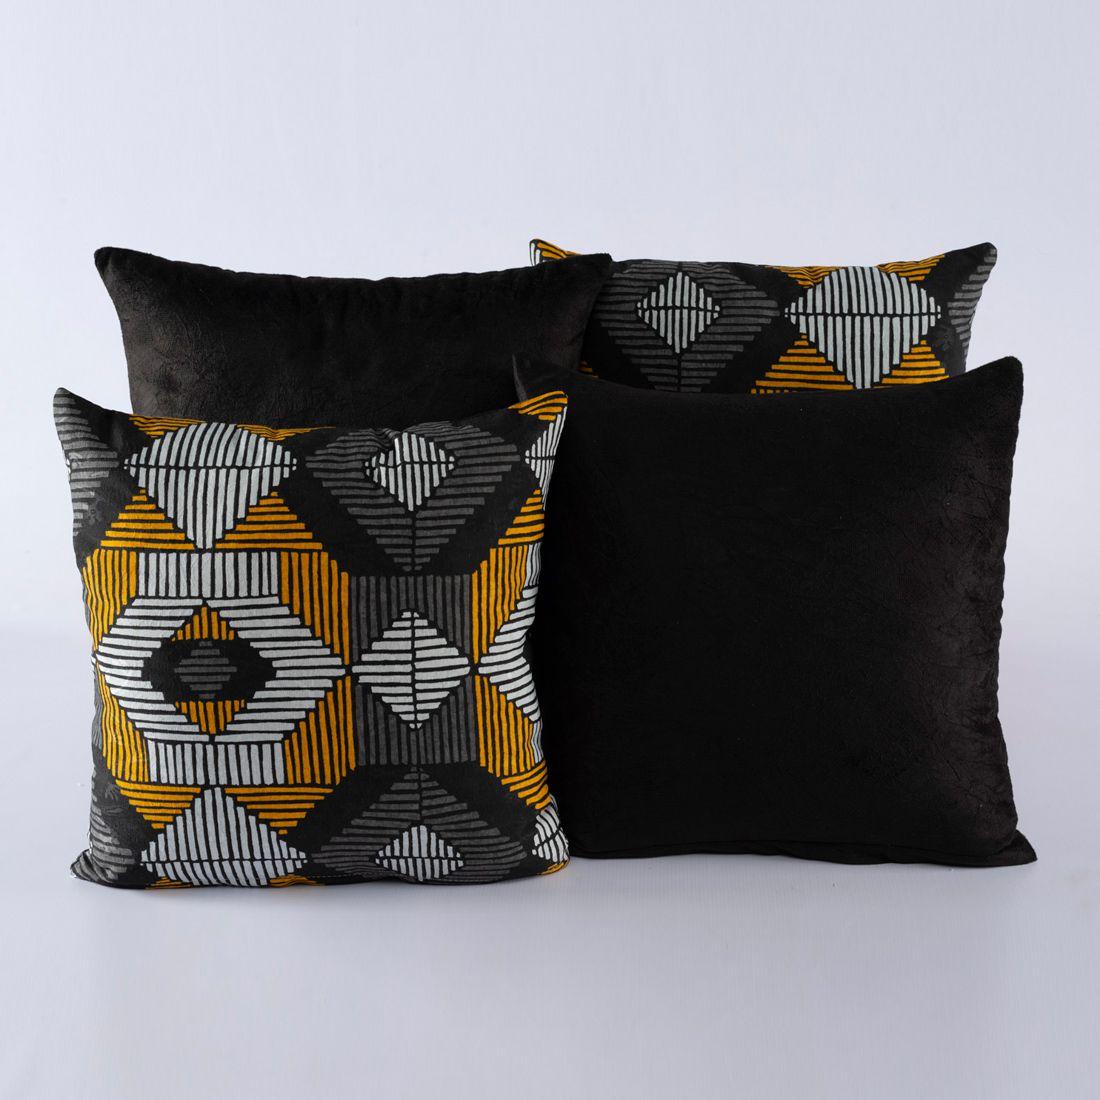 Kit c/ 4 Almofadas Cheias Decorativas Geométrico Preto/Amarelo